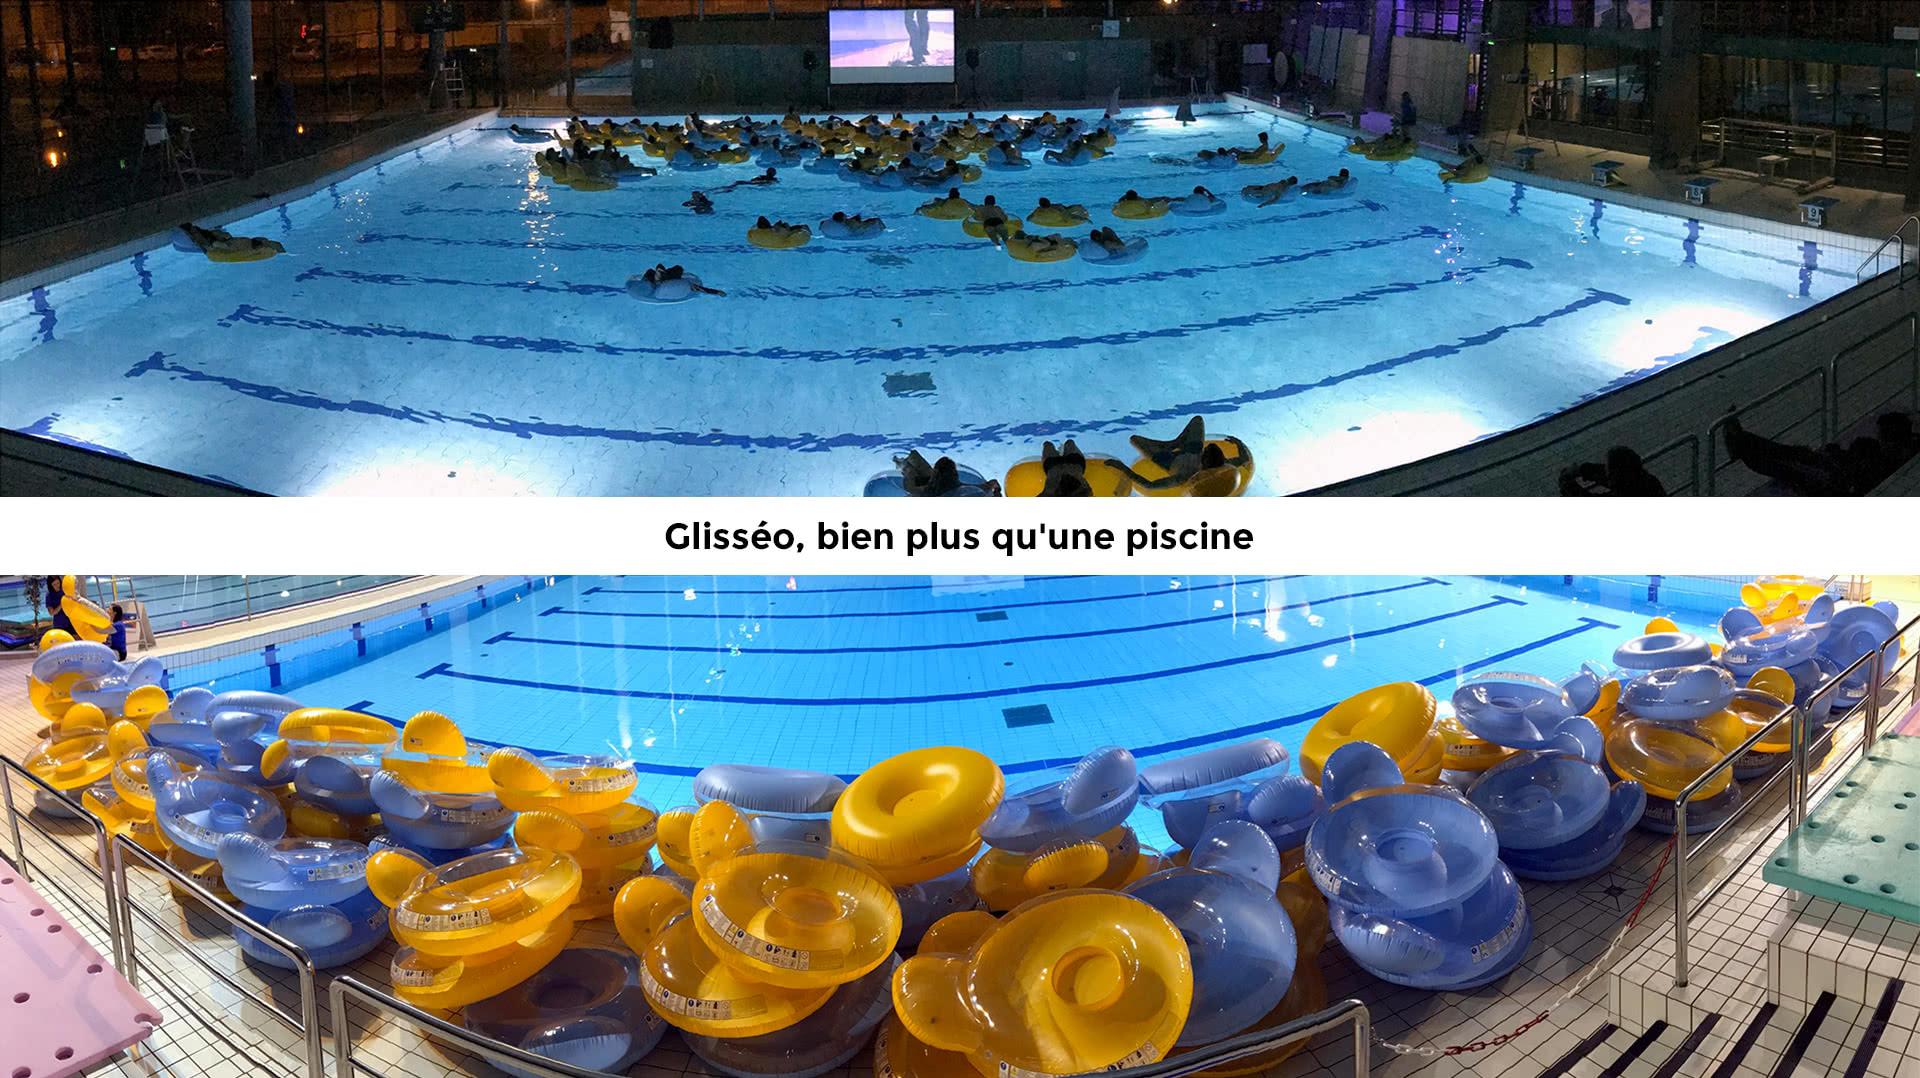 Piscines horaires tarifs activit s animations gliss o - Horaire tarif piscine iceo calais ...